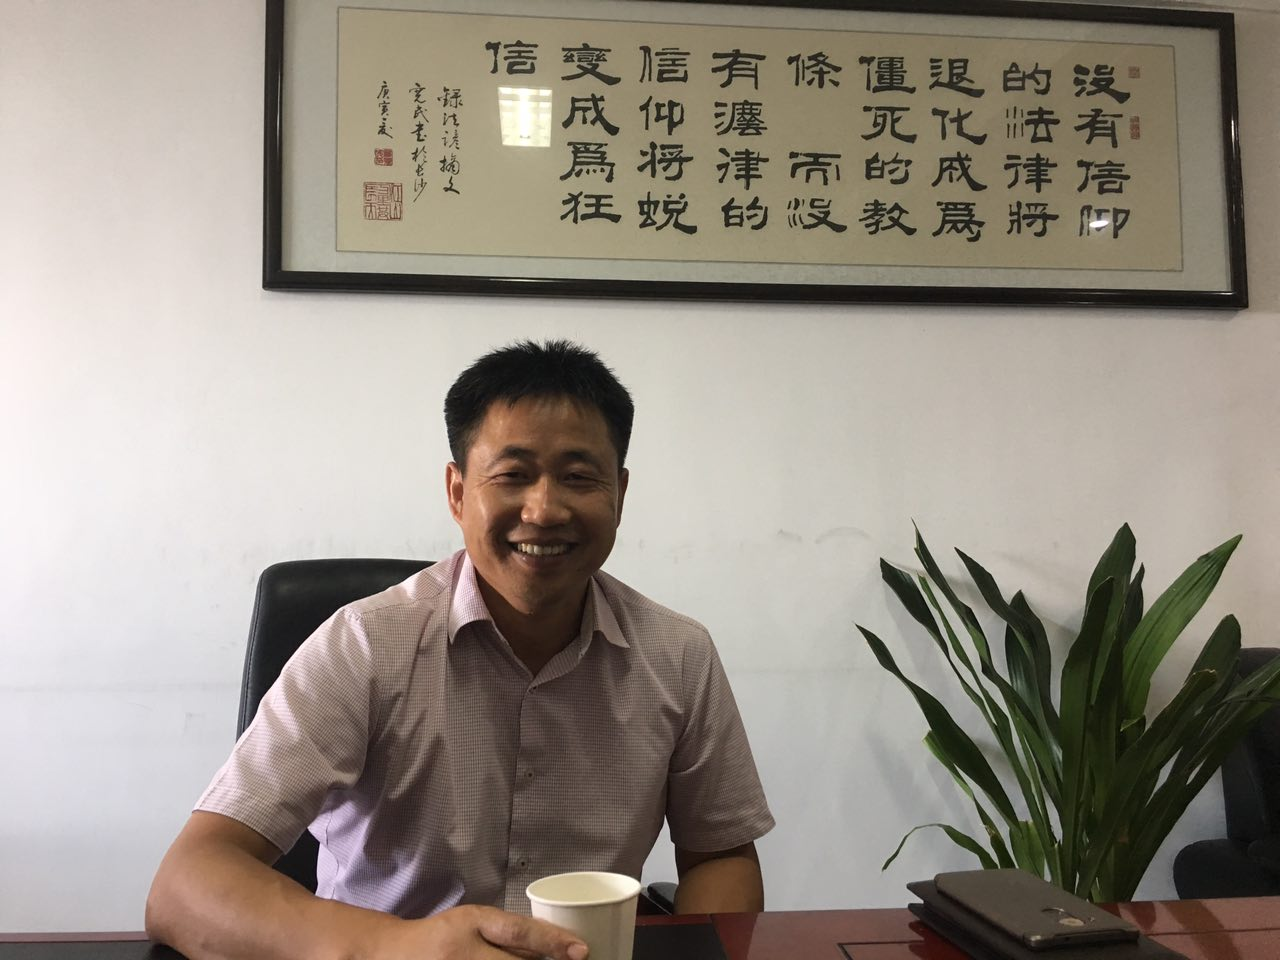 Xie Yang_7月13日上班